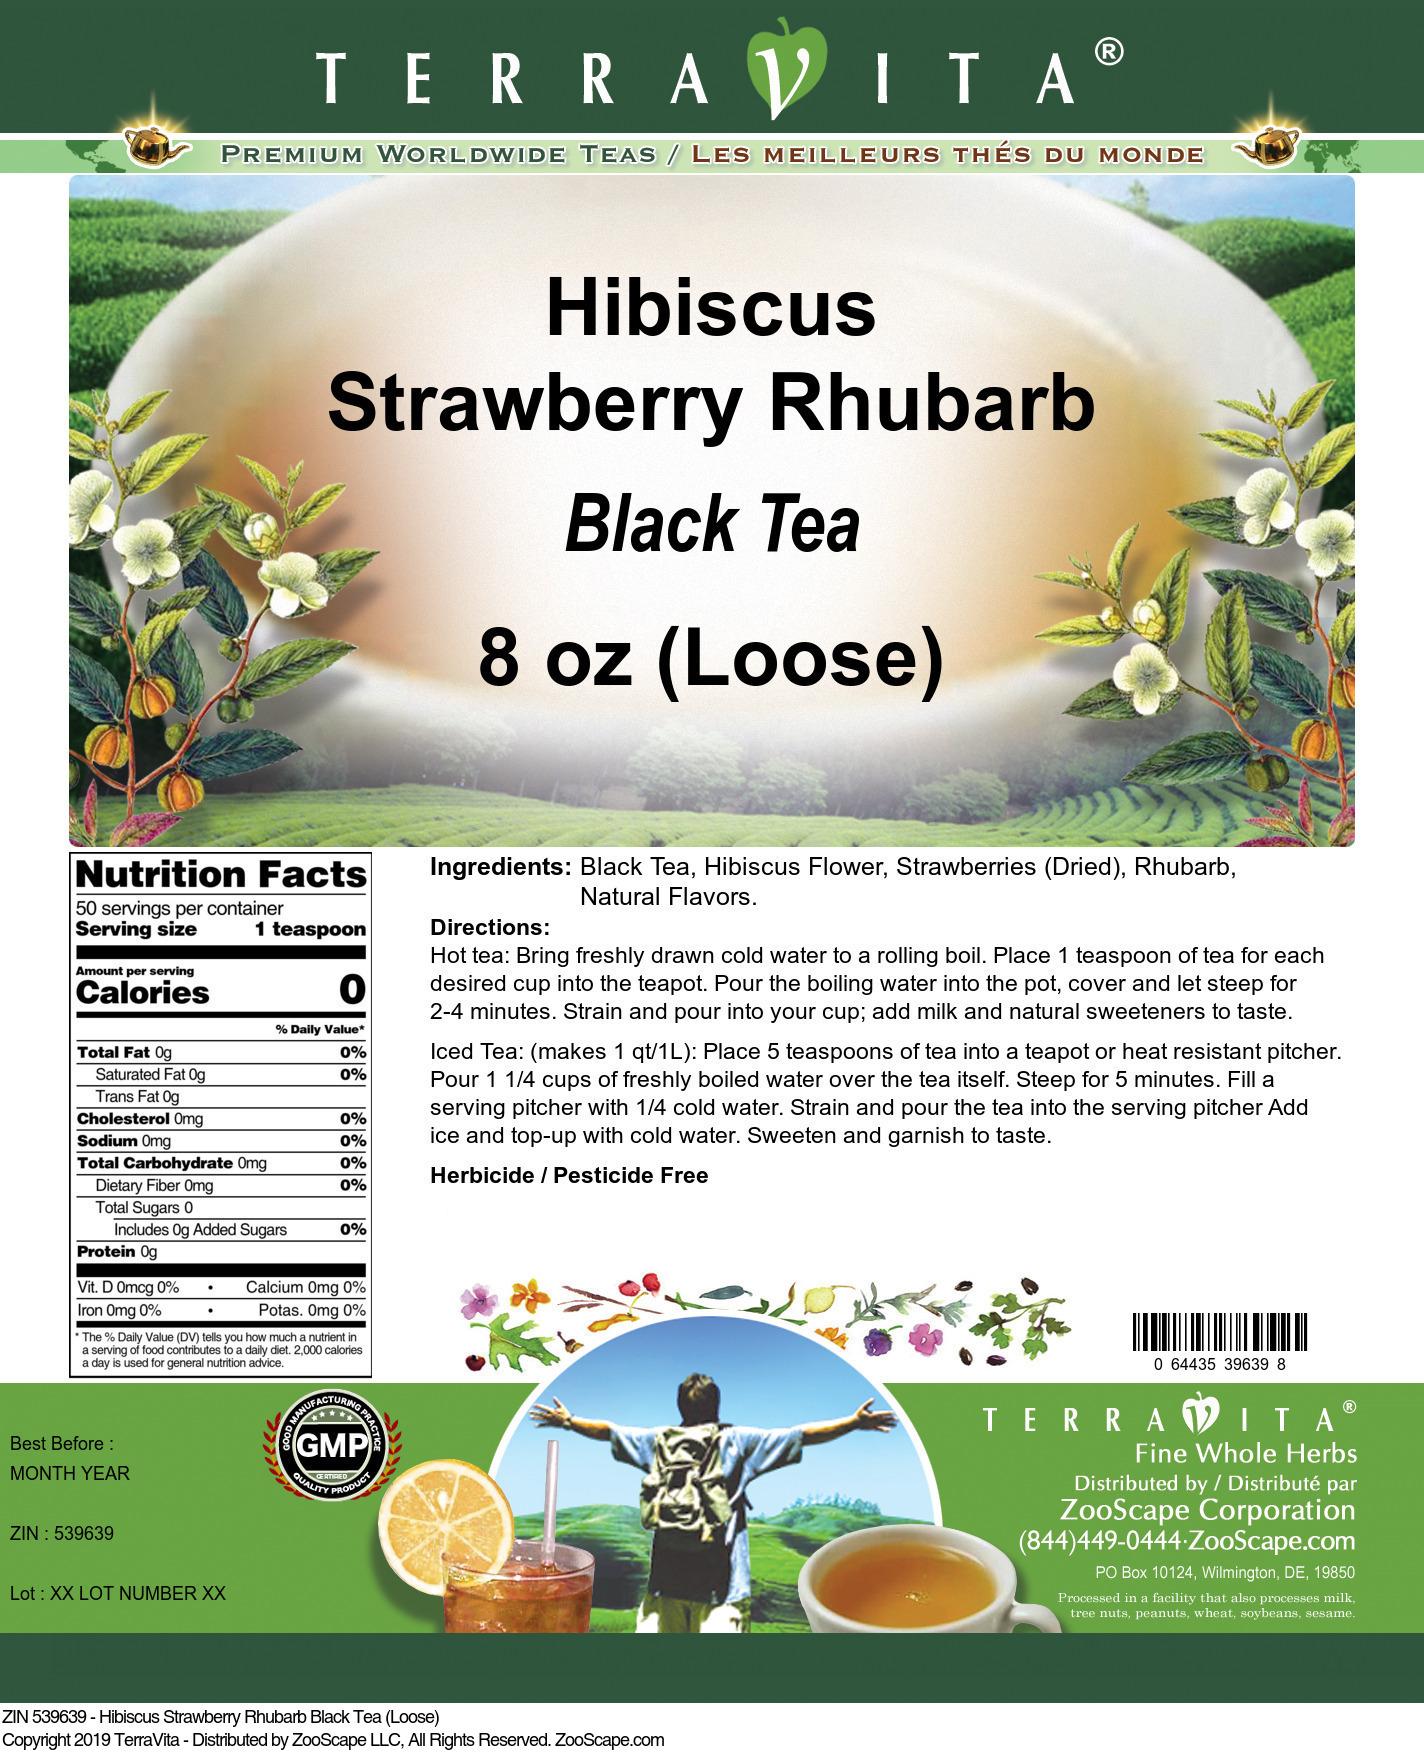 Hibiscus Strawberry Rhubarb Black Tea